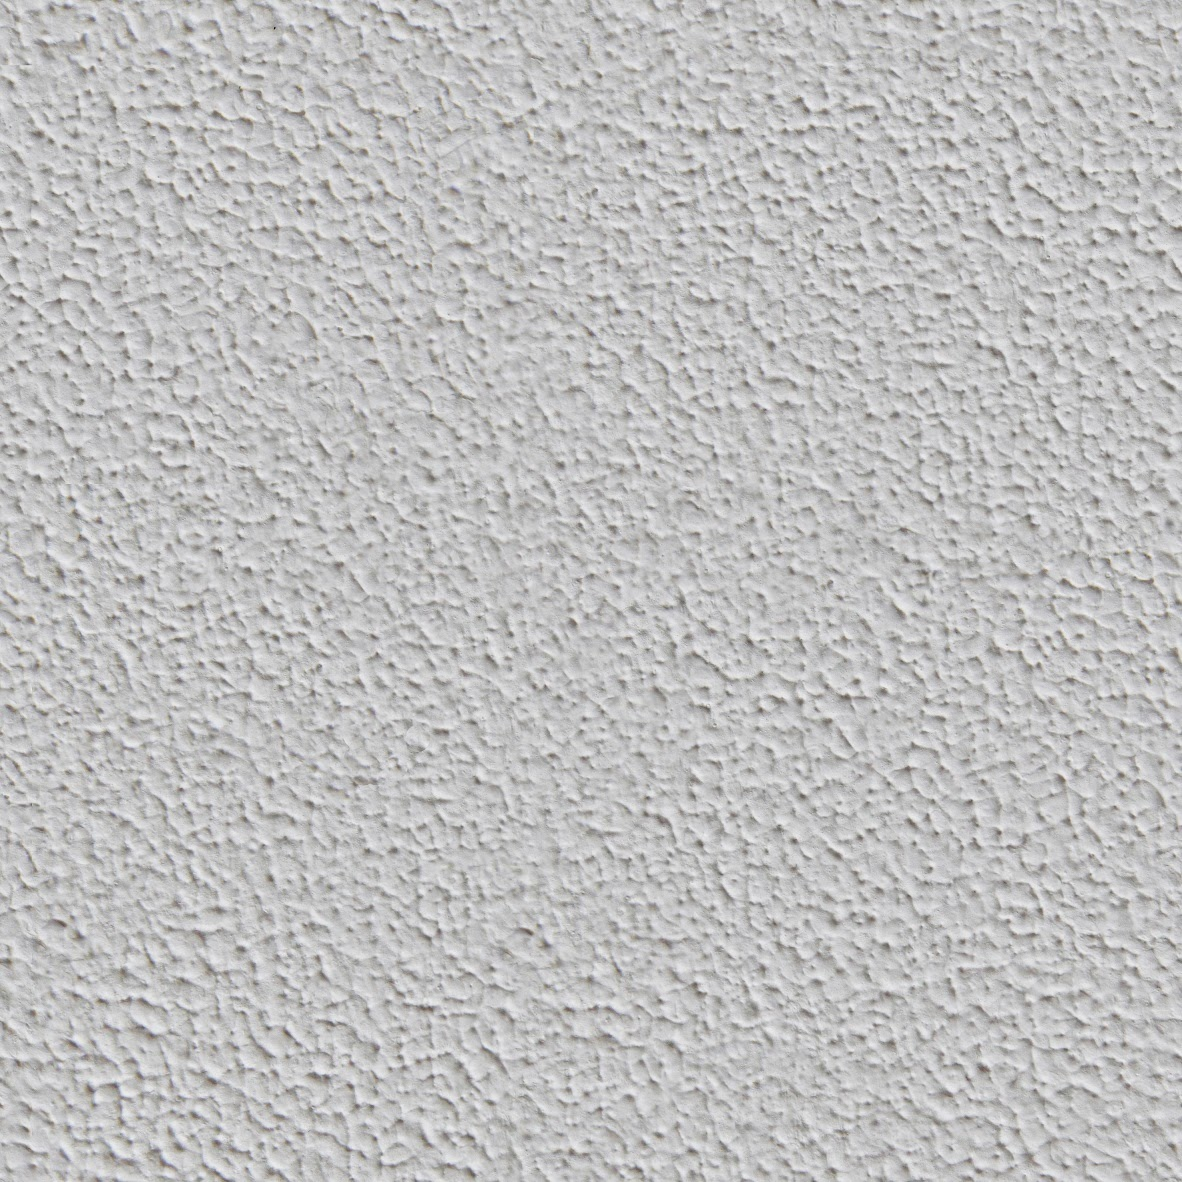 Simo 3d Spot Texture Seamless